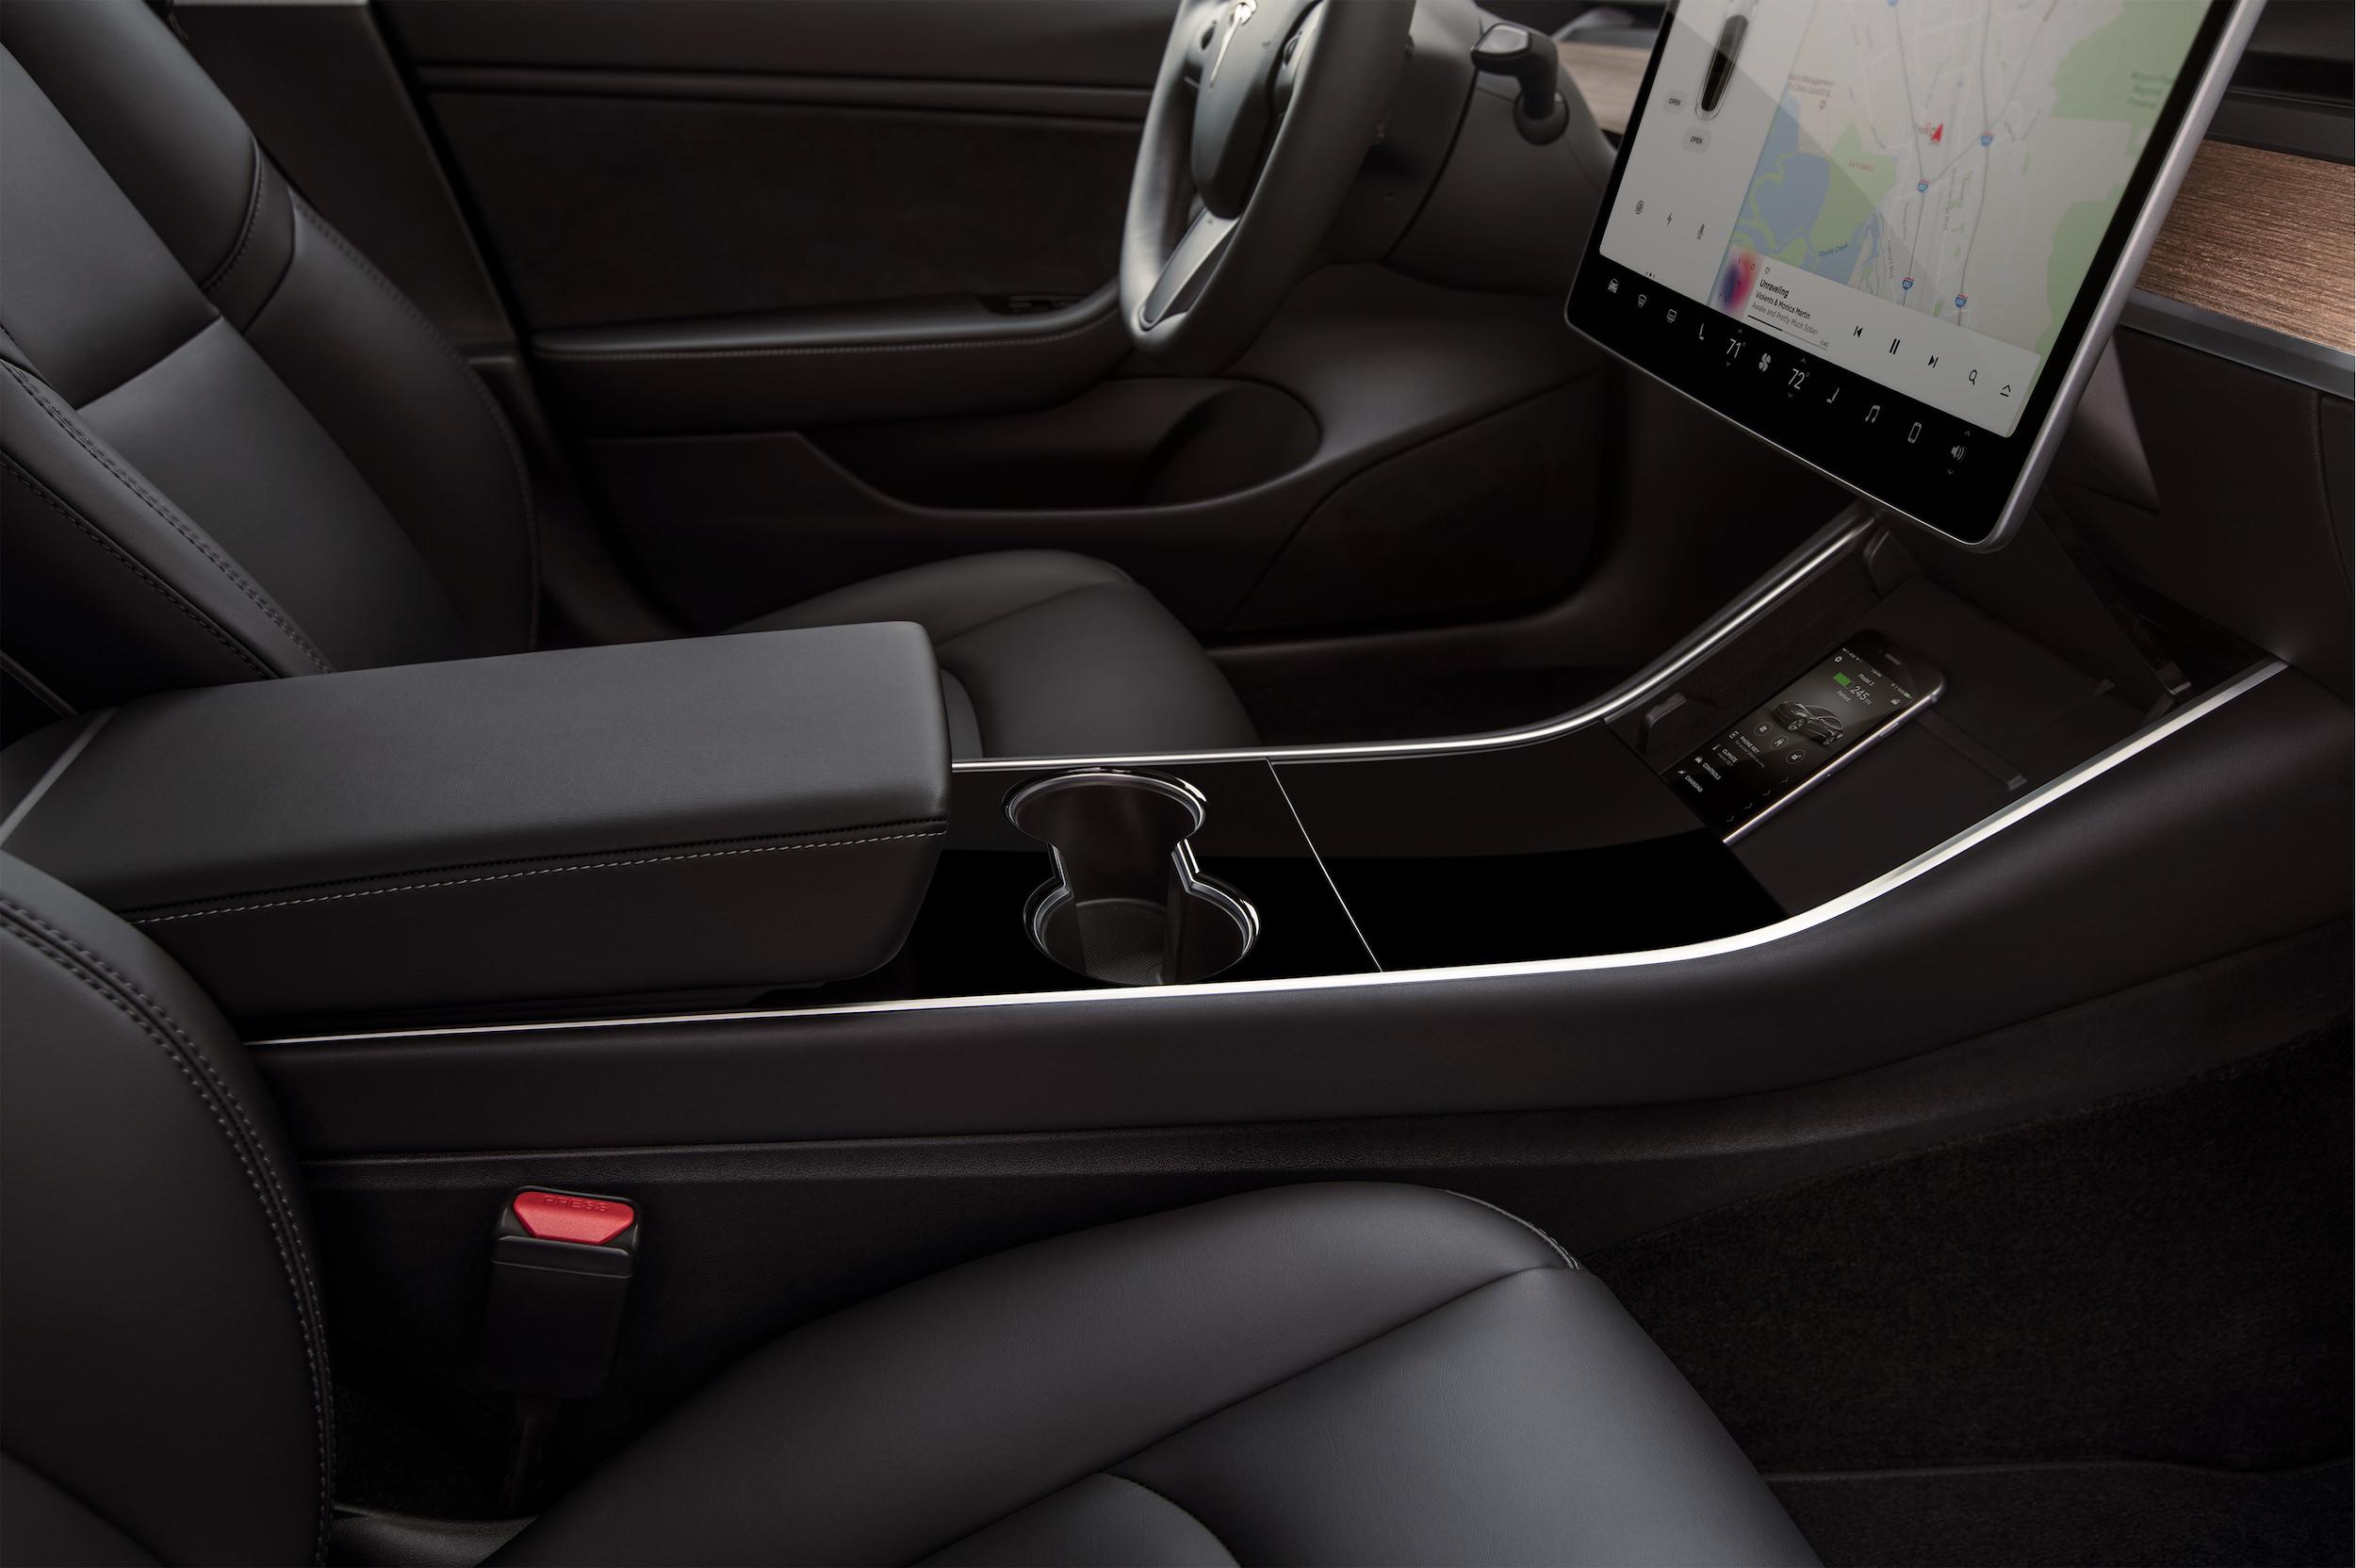 Model 3 – Interior Phone Dock